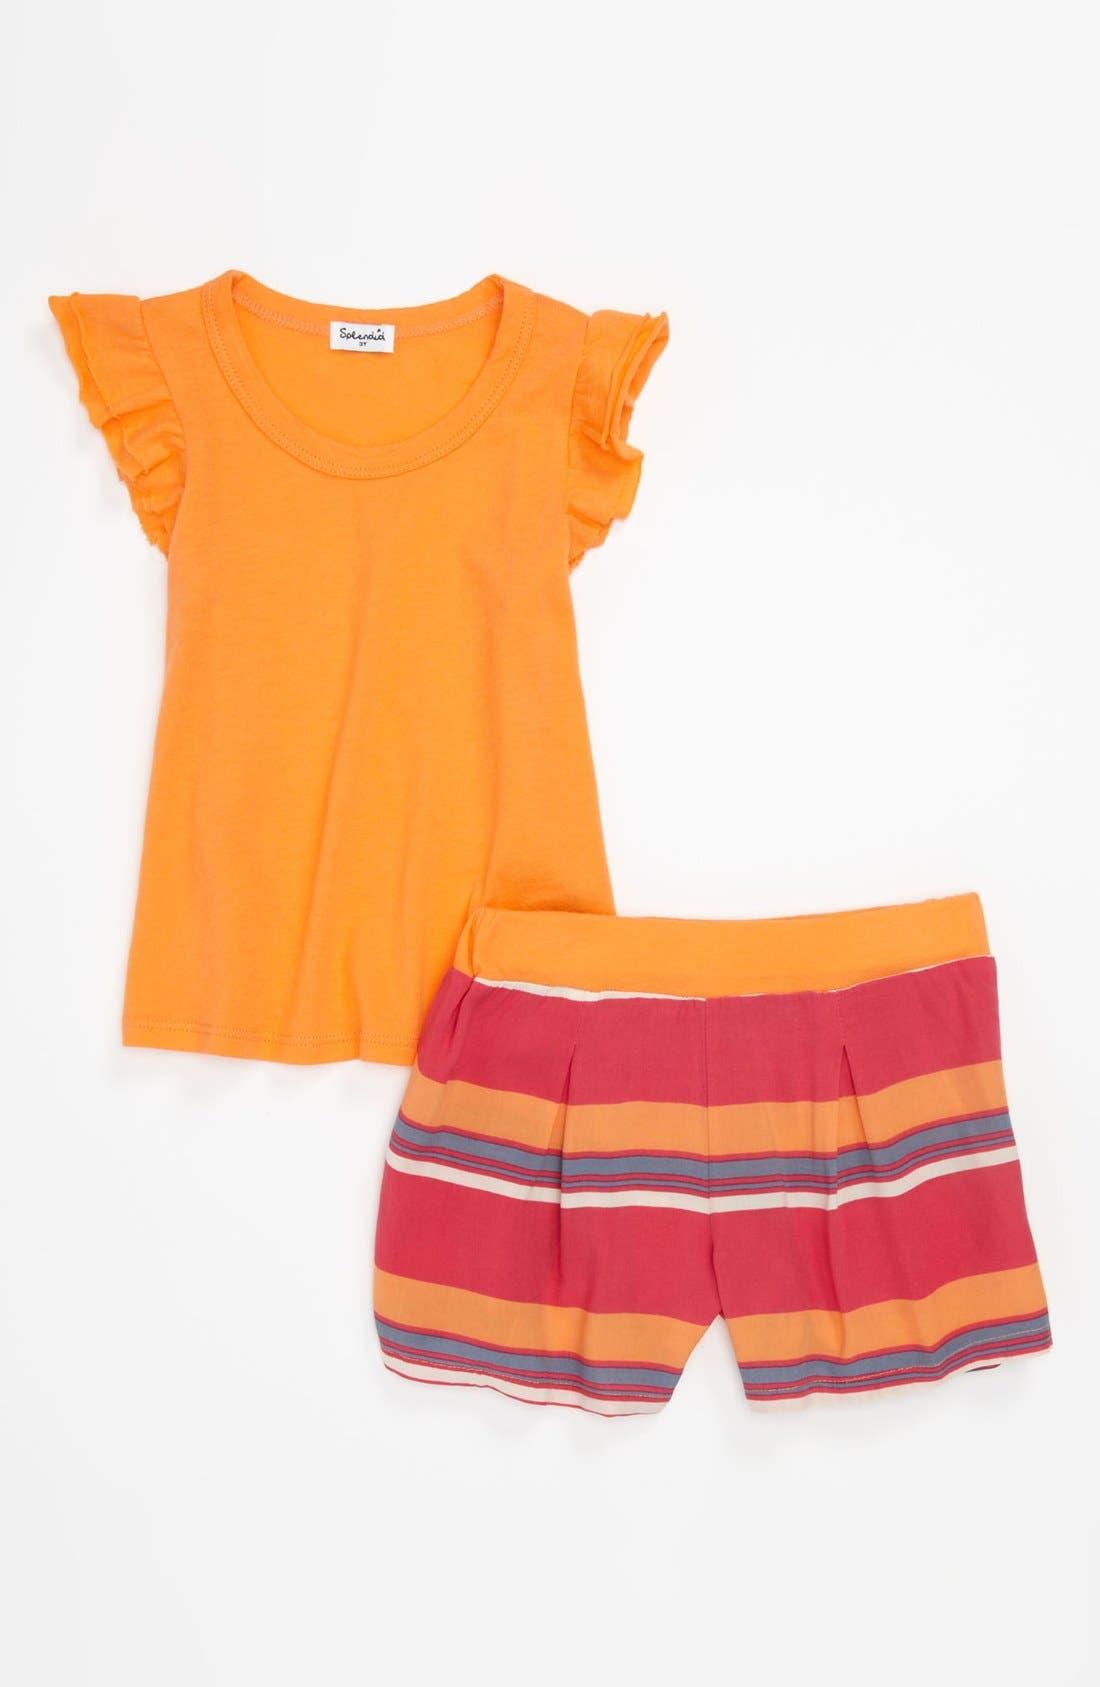 Alternate Image 1 Selected - Splendid 'Cannes' Stripe Voile Short Set (Toddler)